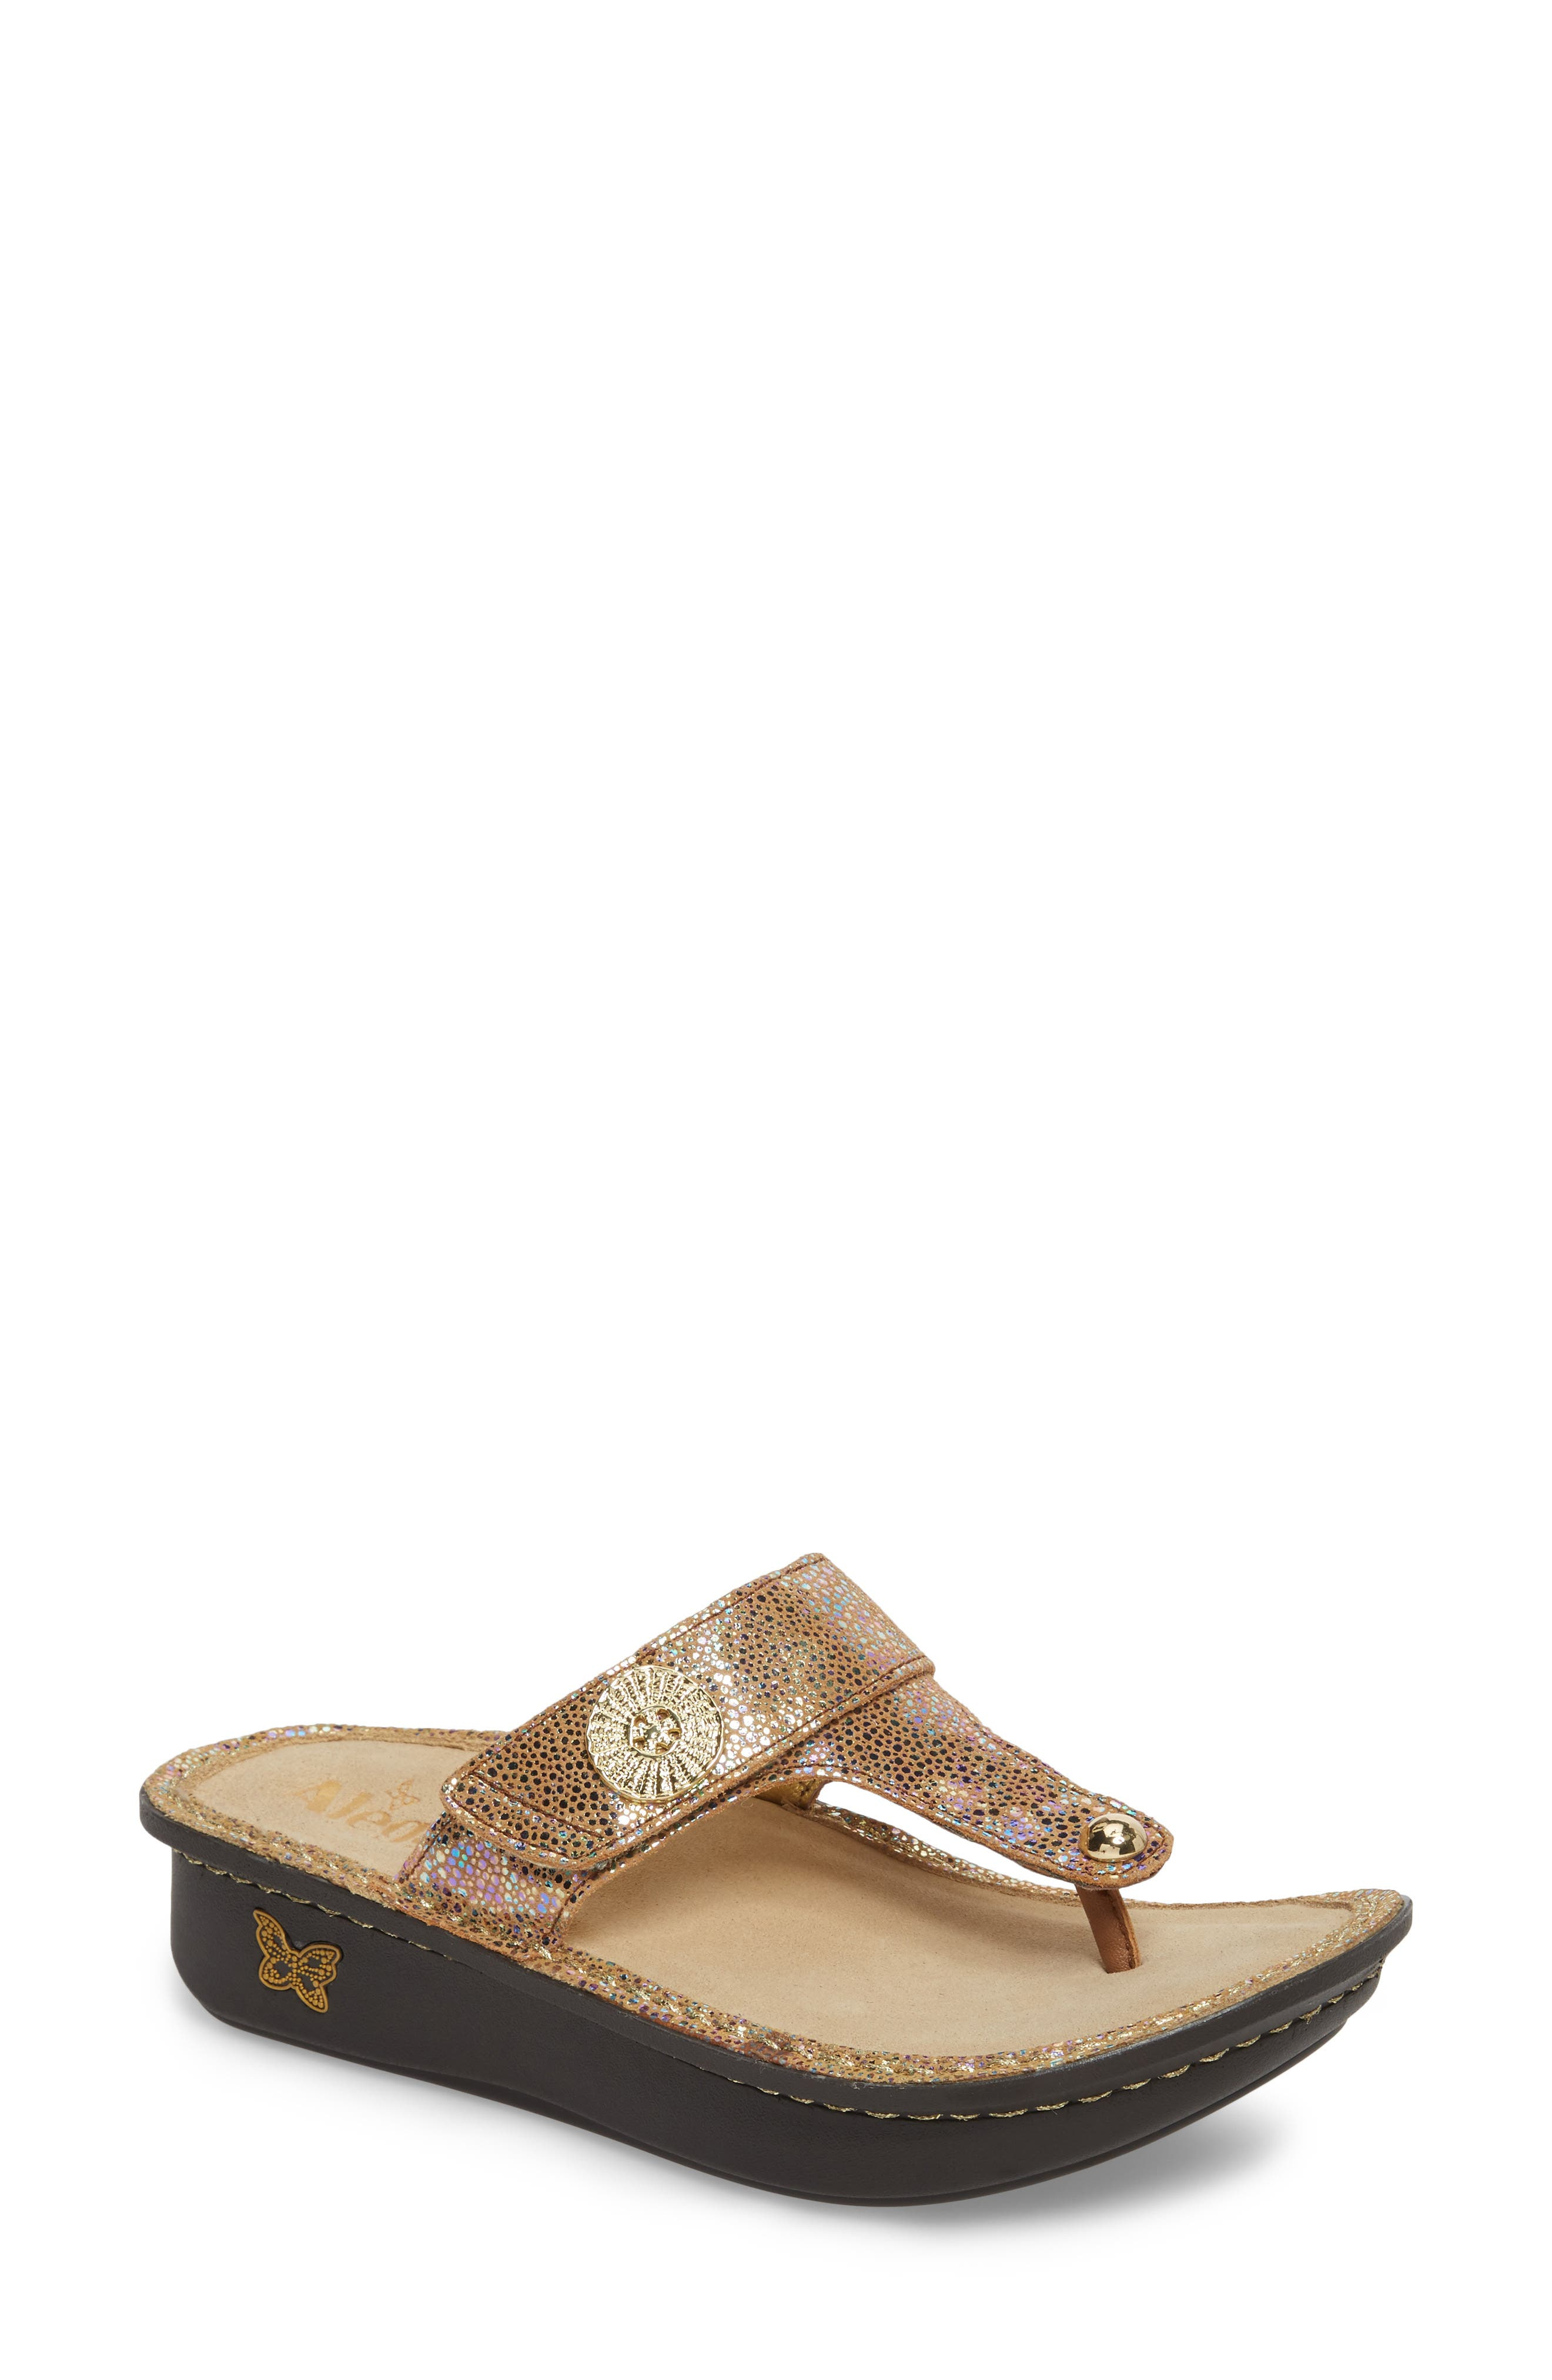 Alternate Image 1 Selected - Alegria 'Carina' Sandal